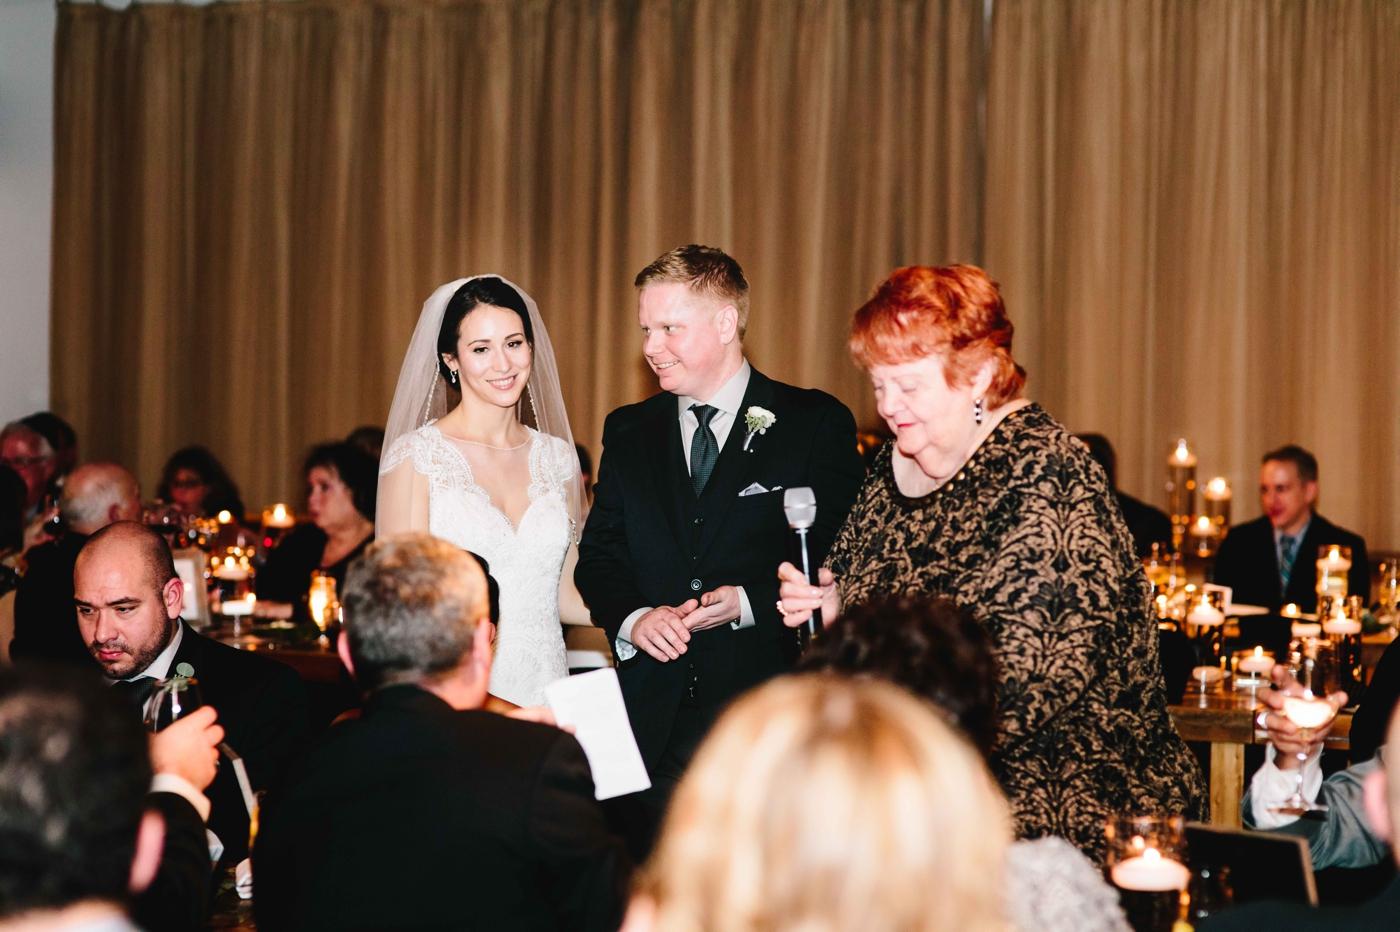 chicago-fine-art-wedding-photography-lintelman40